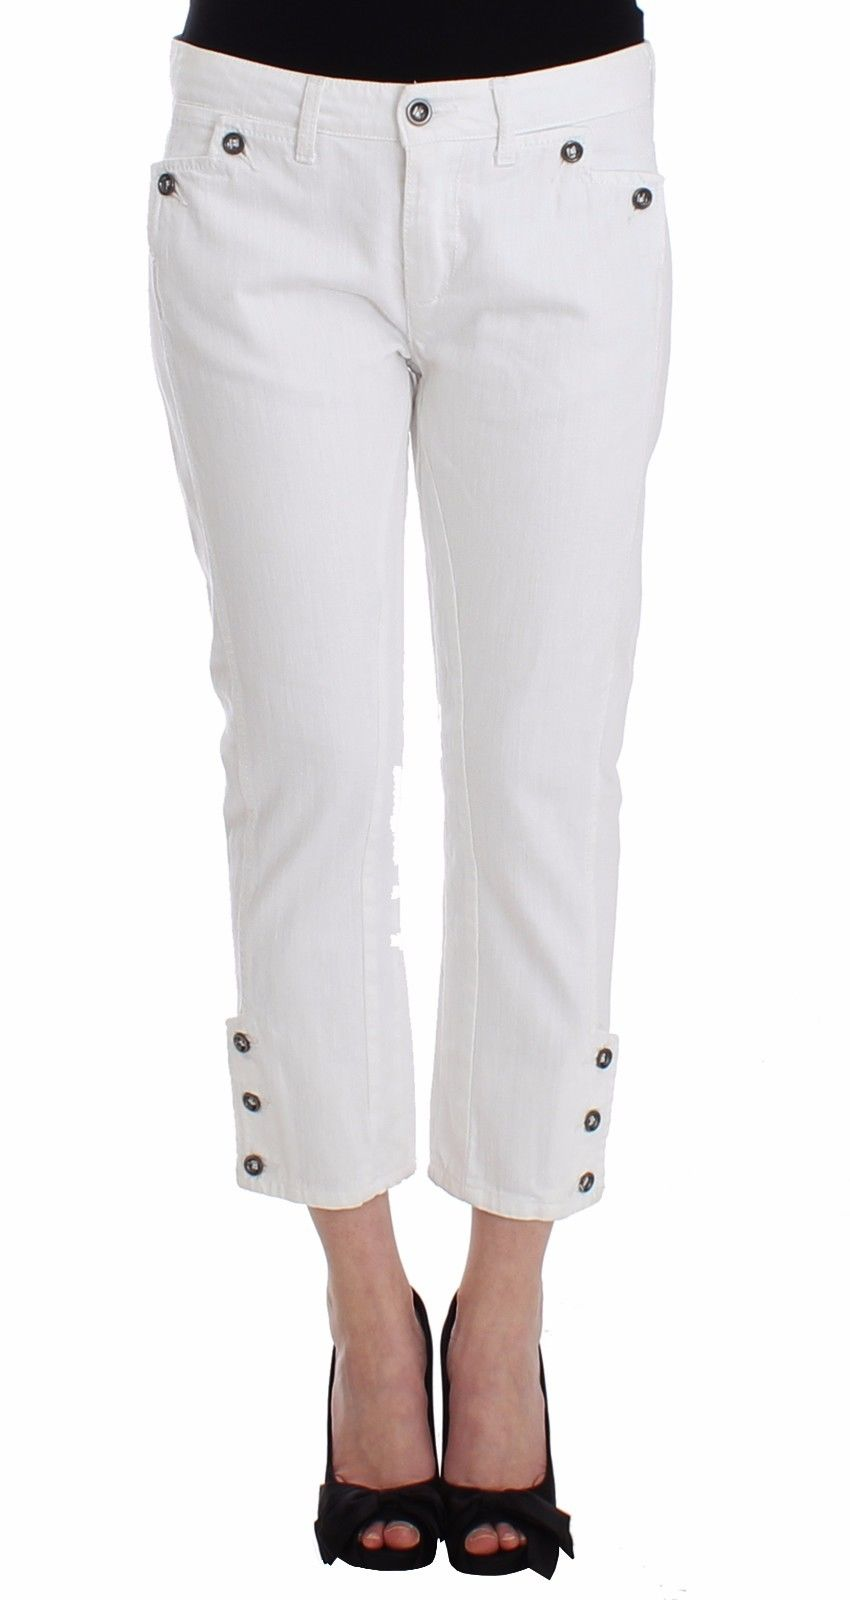 eca8e743d41d Ermanno Scervino White Cropped Jeans Denim Pants Branded Capri • Top ...